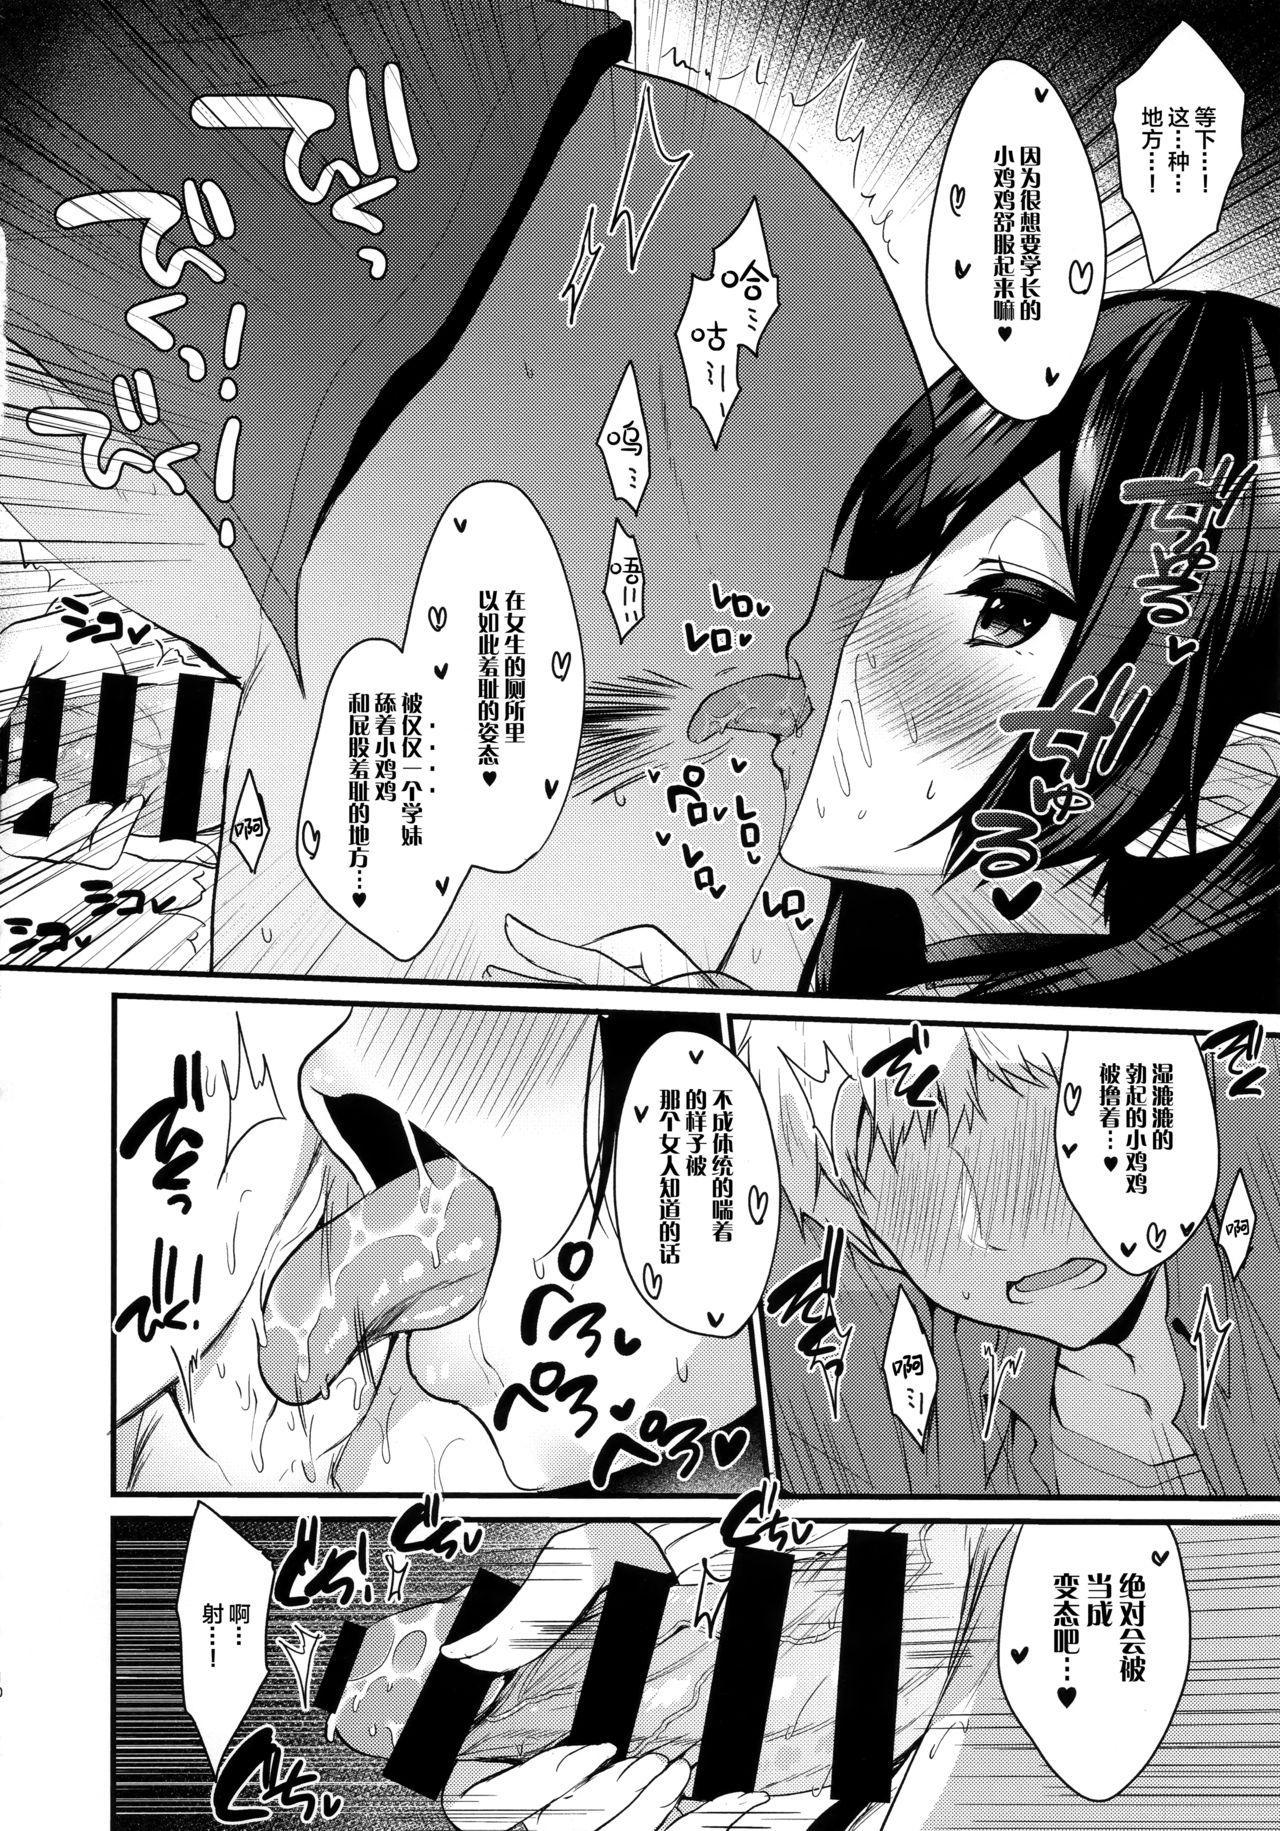 Koakuma-chan no Kougeki! 3 Onnanoko no toilet de Hen 9